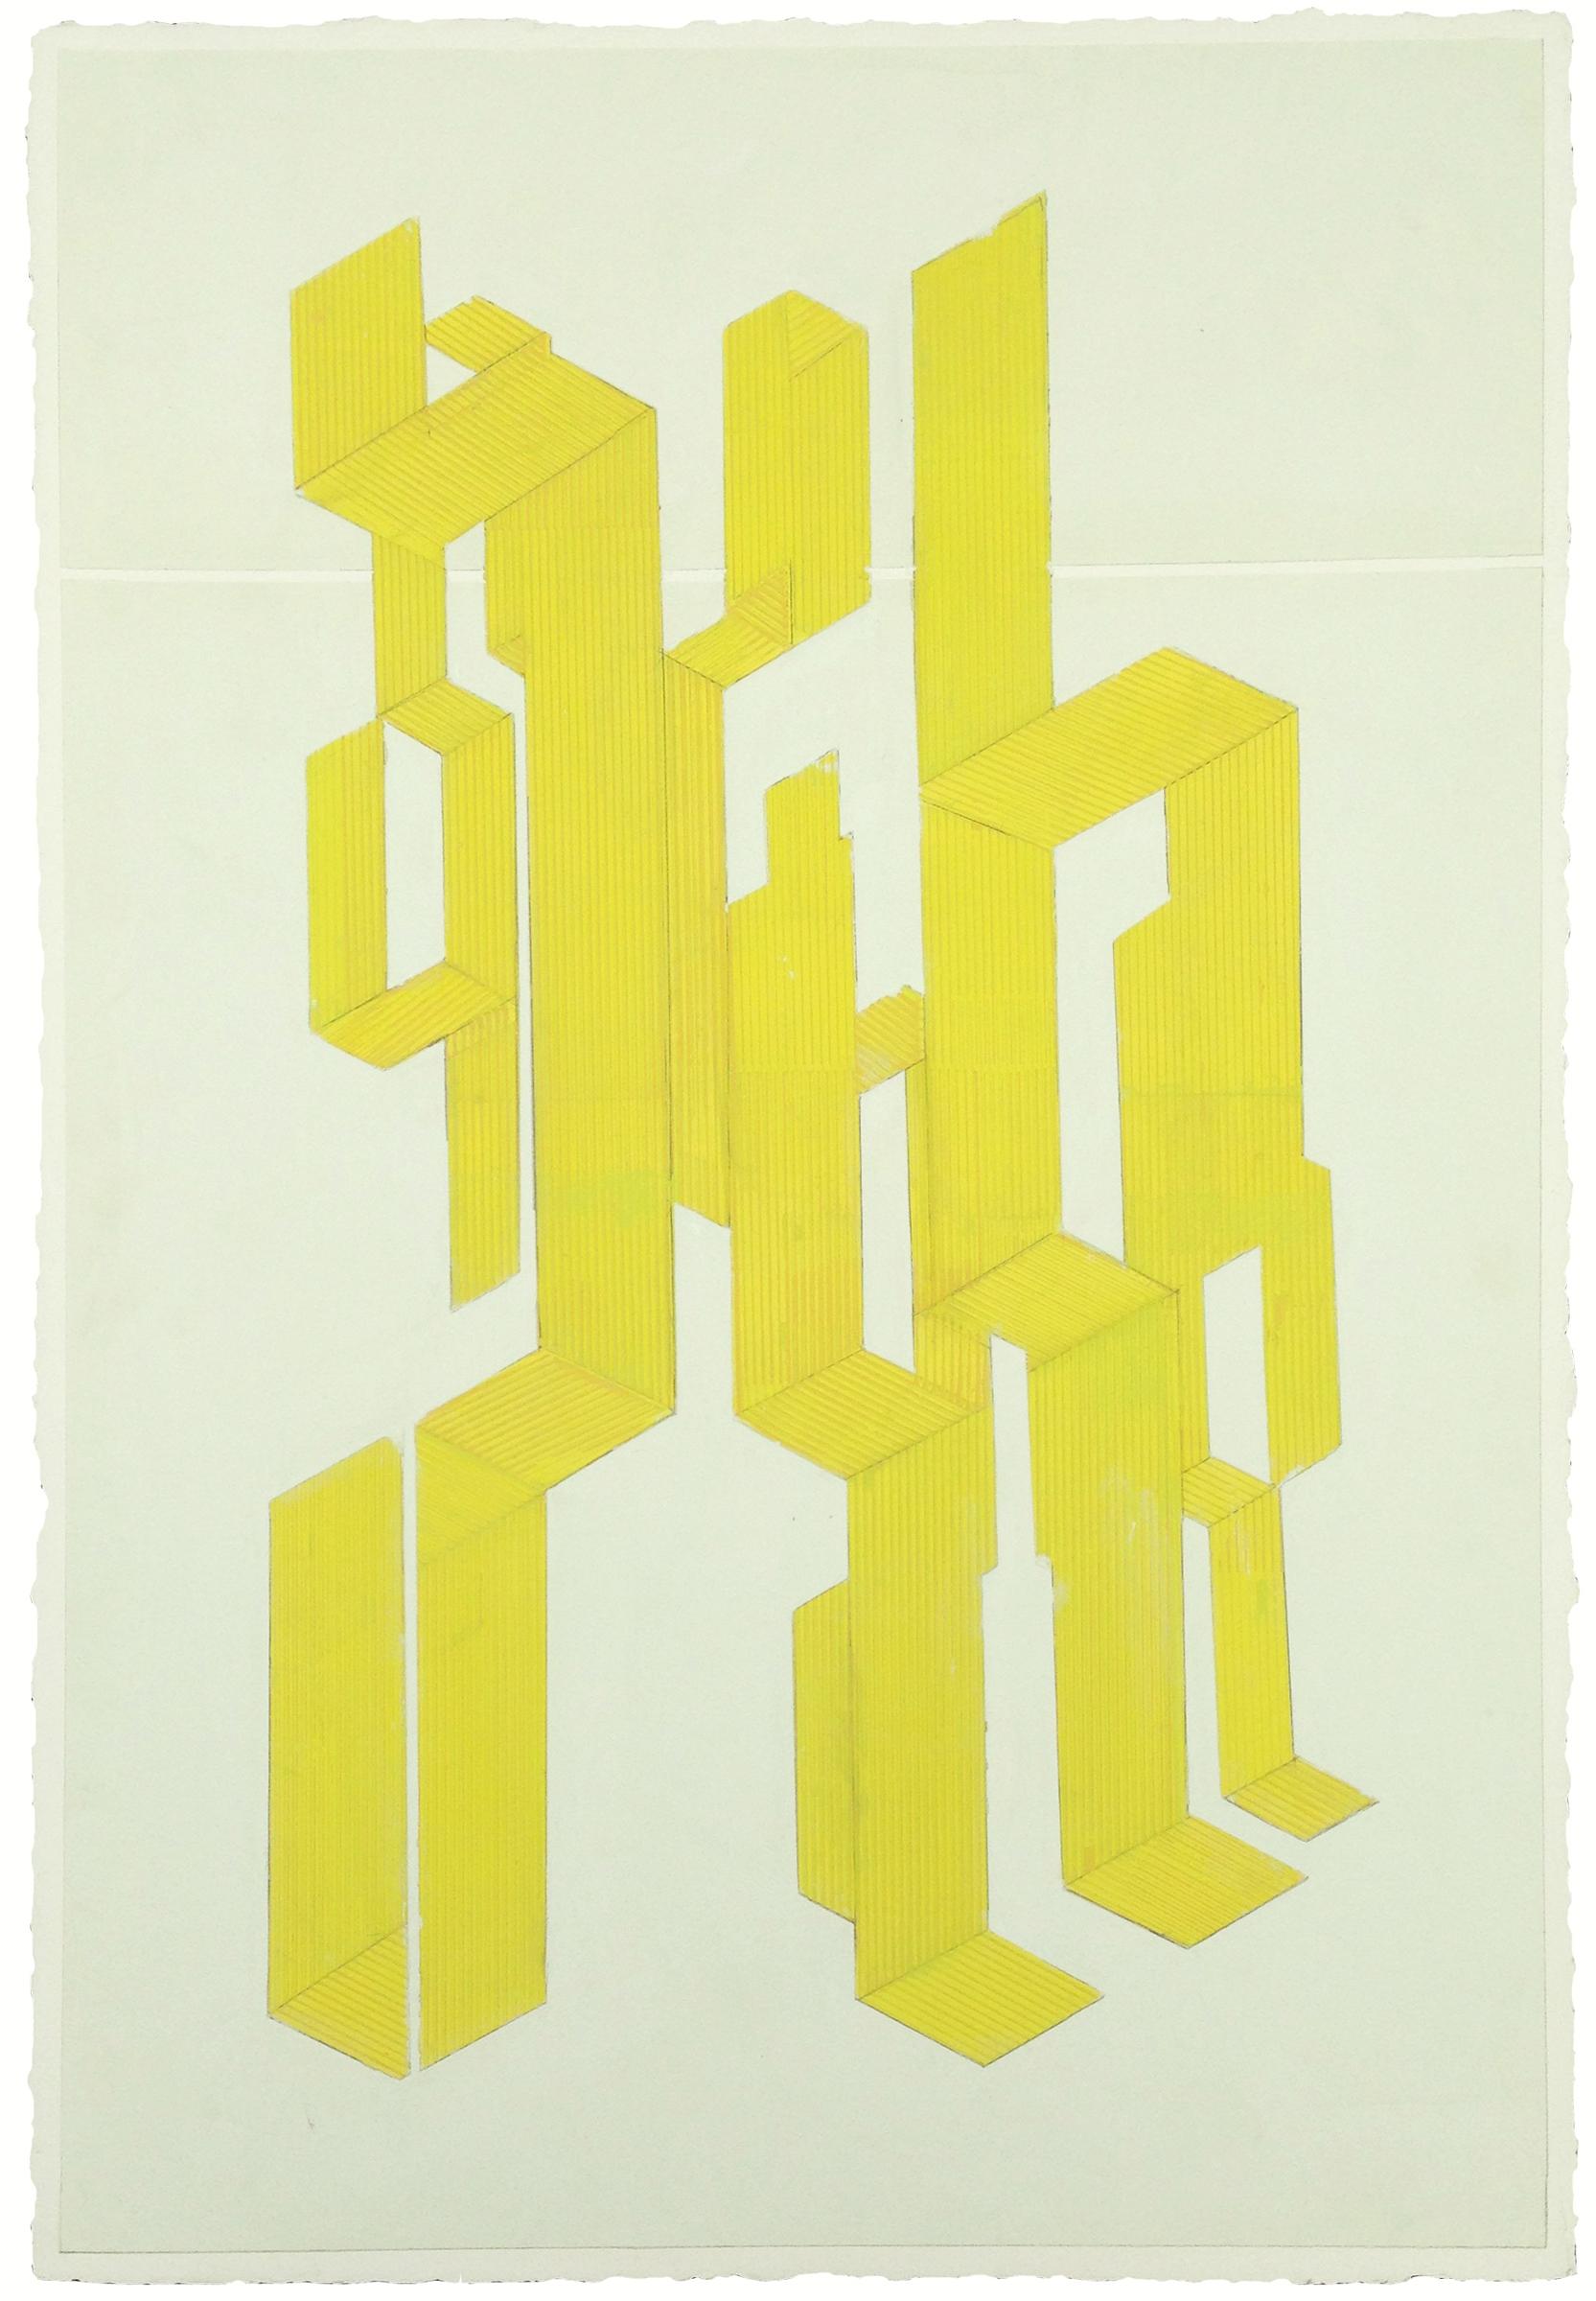 "ELISE FERGUSON   Table , pigmented plaster on MDF panel, 36"" x 24"", 2014"